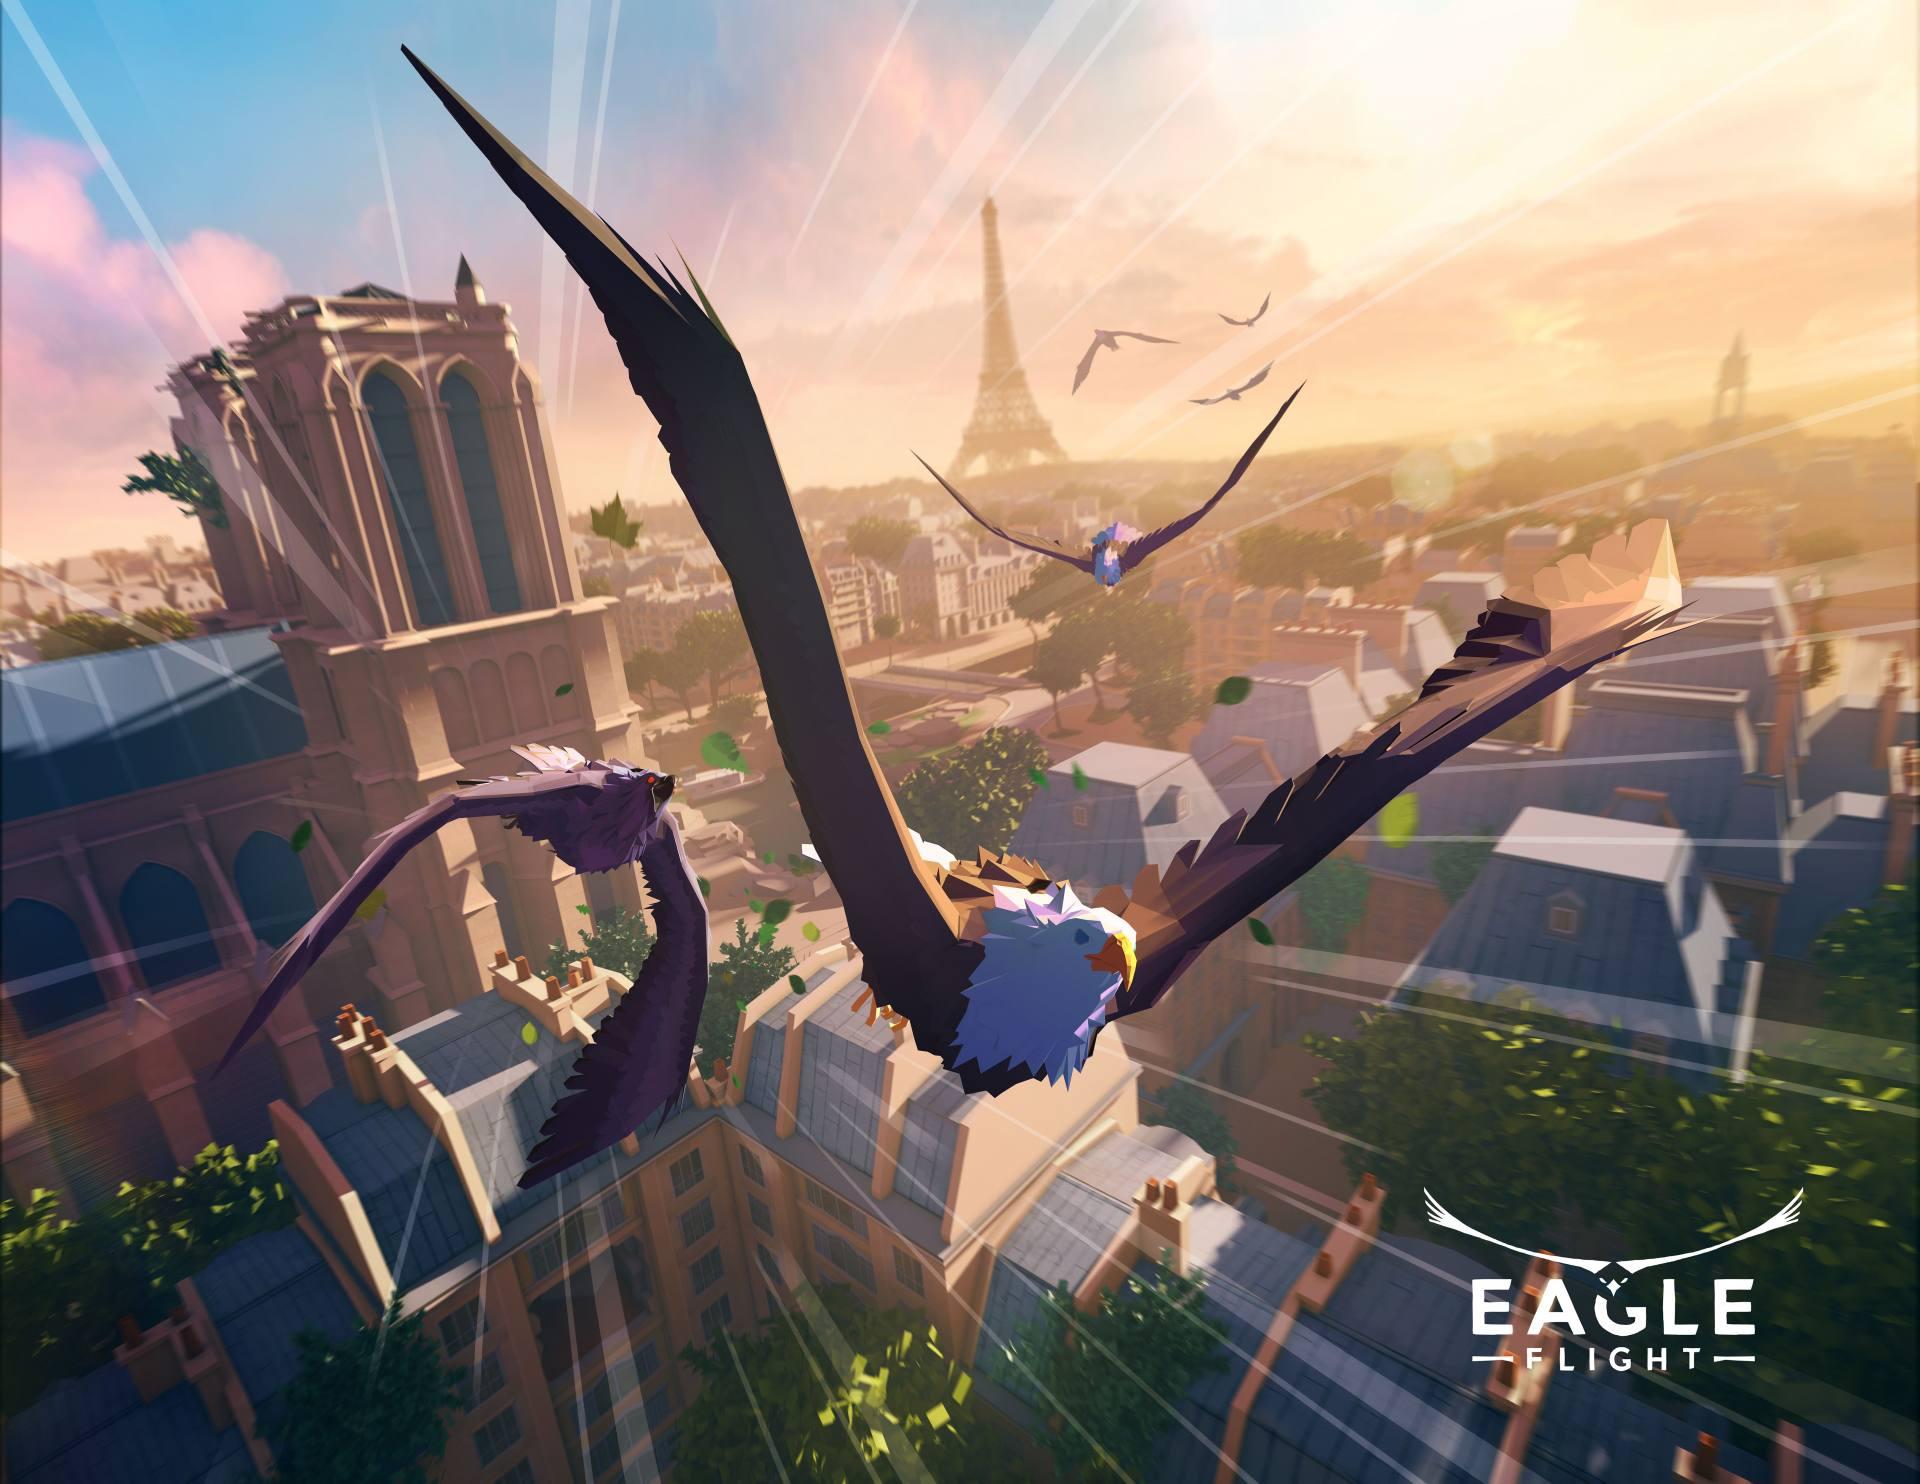 Eagle-Flight_2016_06-13-16_006